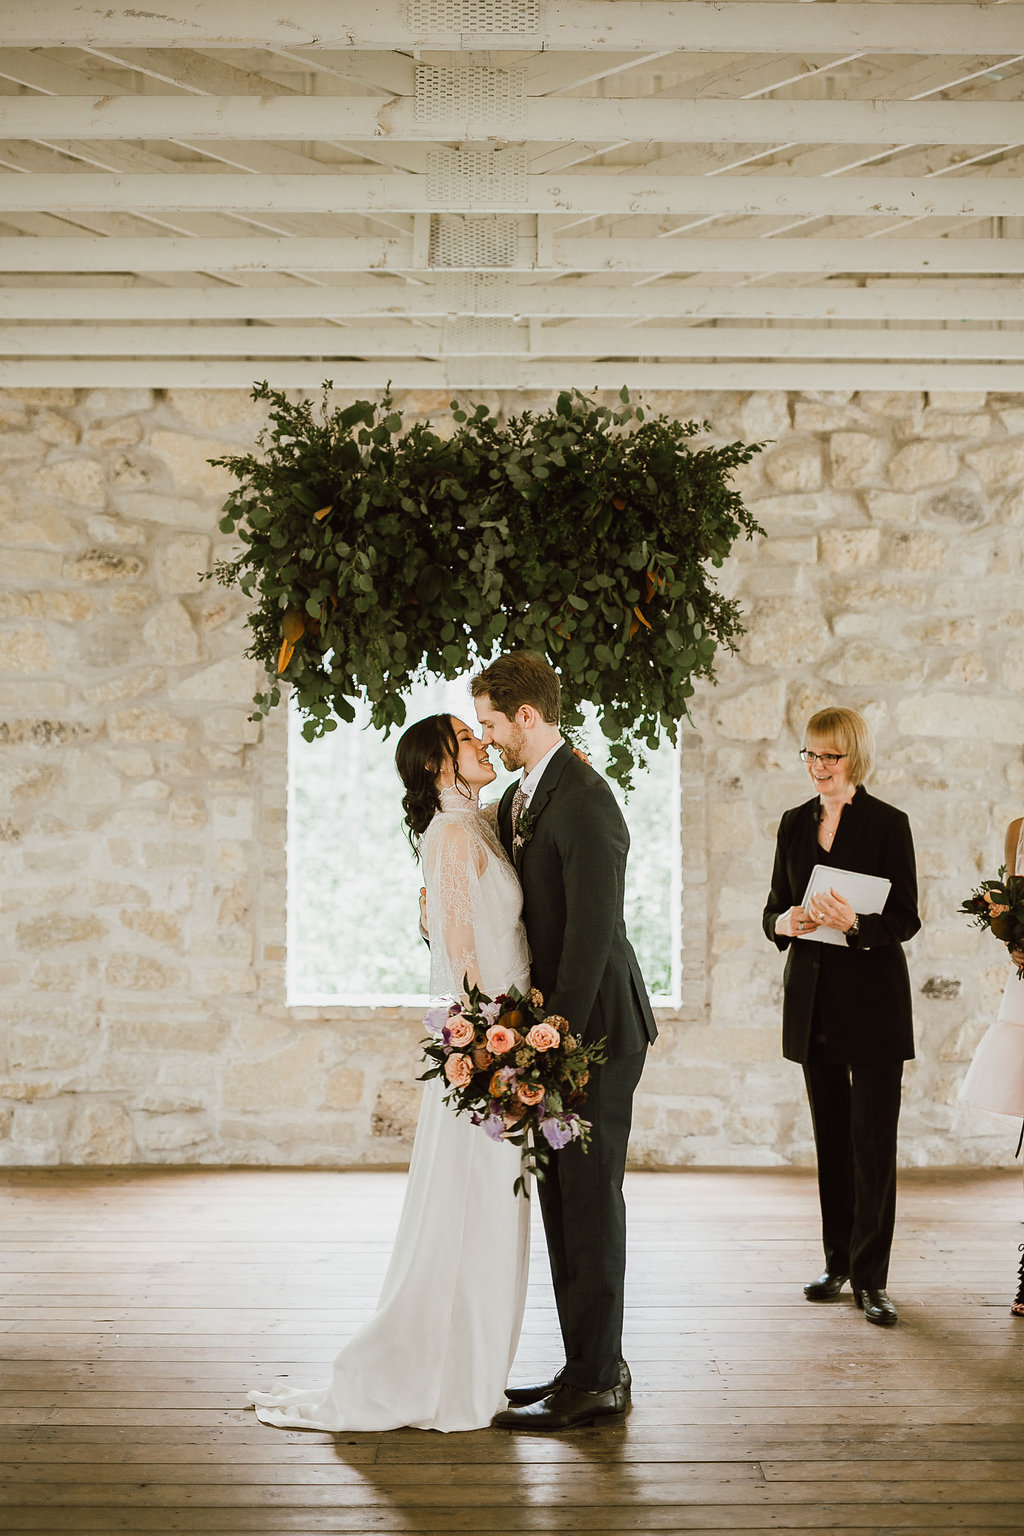 Hanging Greenery Wedding Backdrop - Weddings at Cielo's Garden